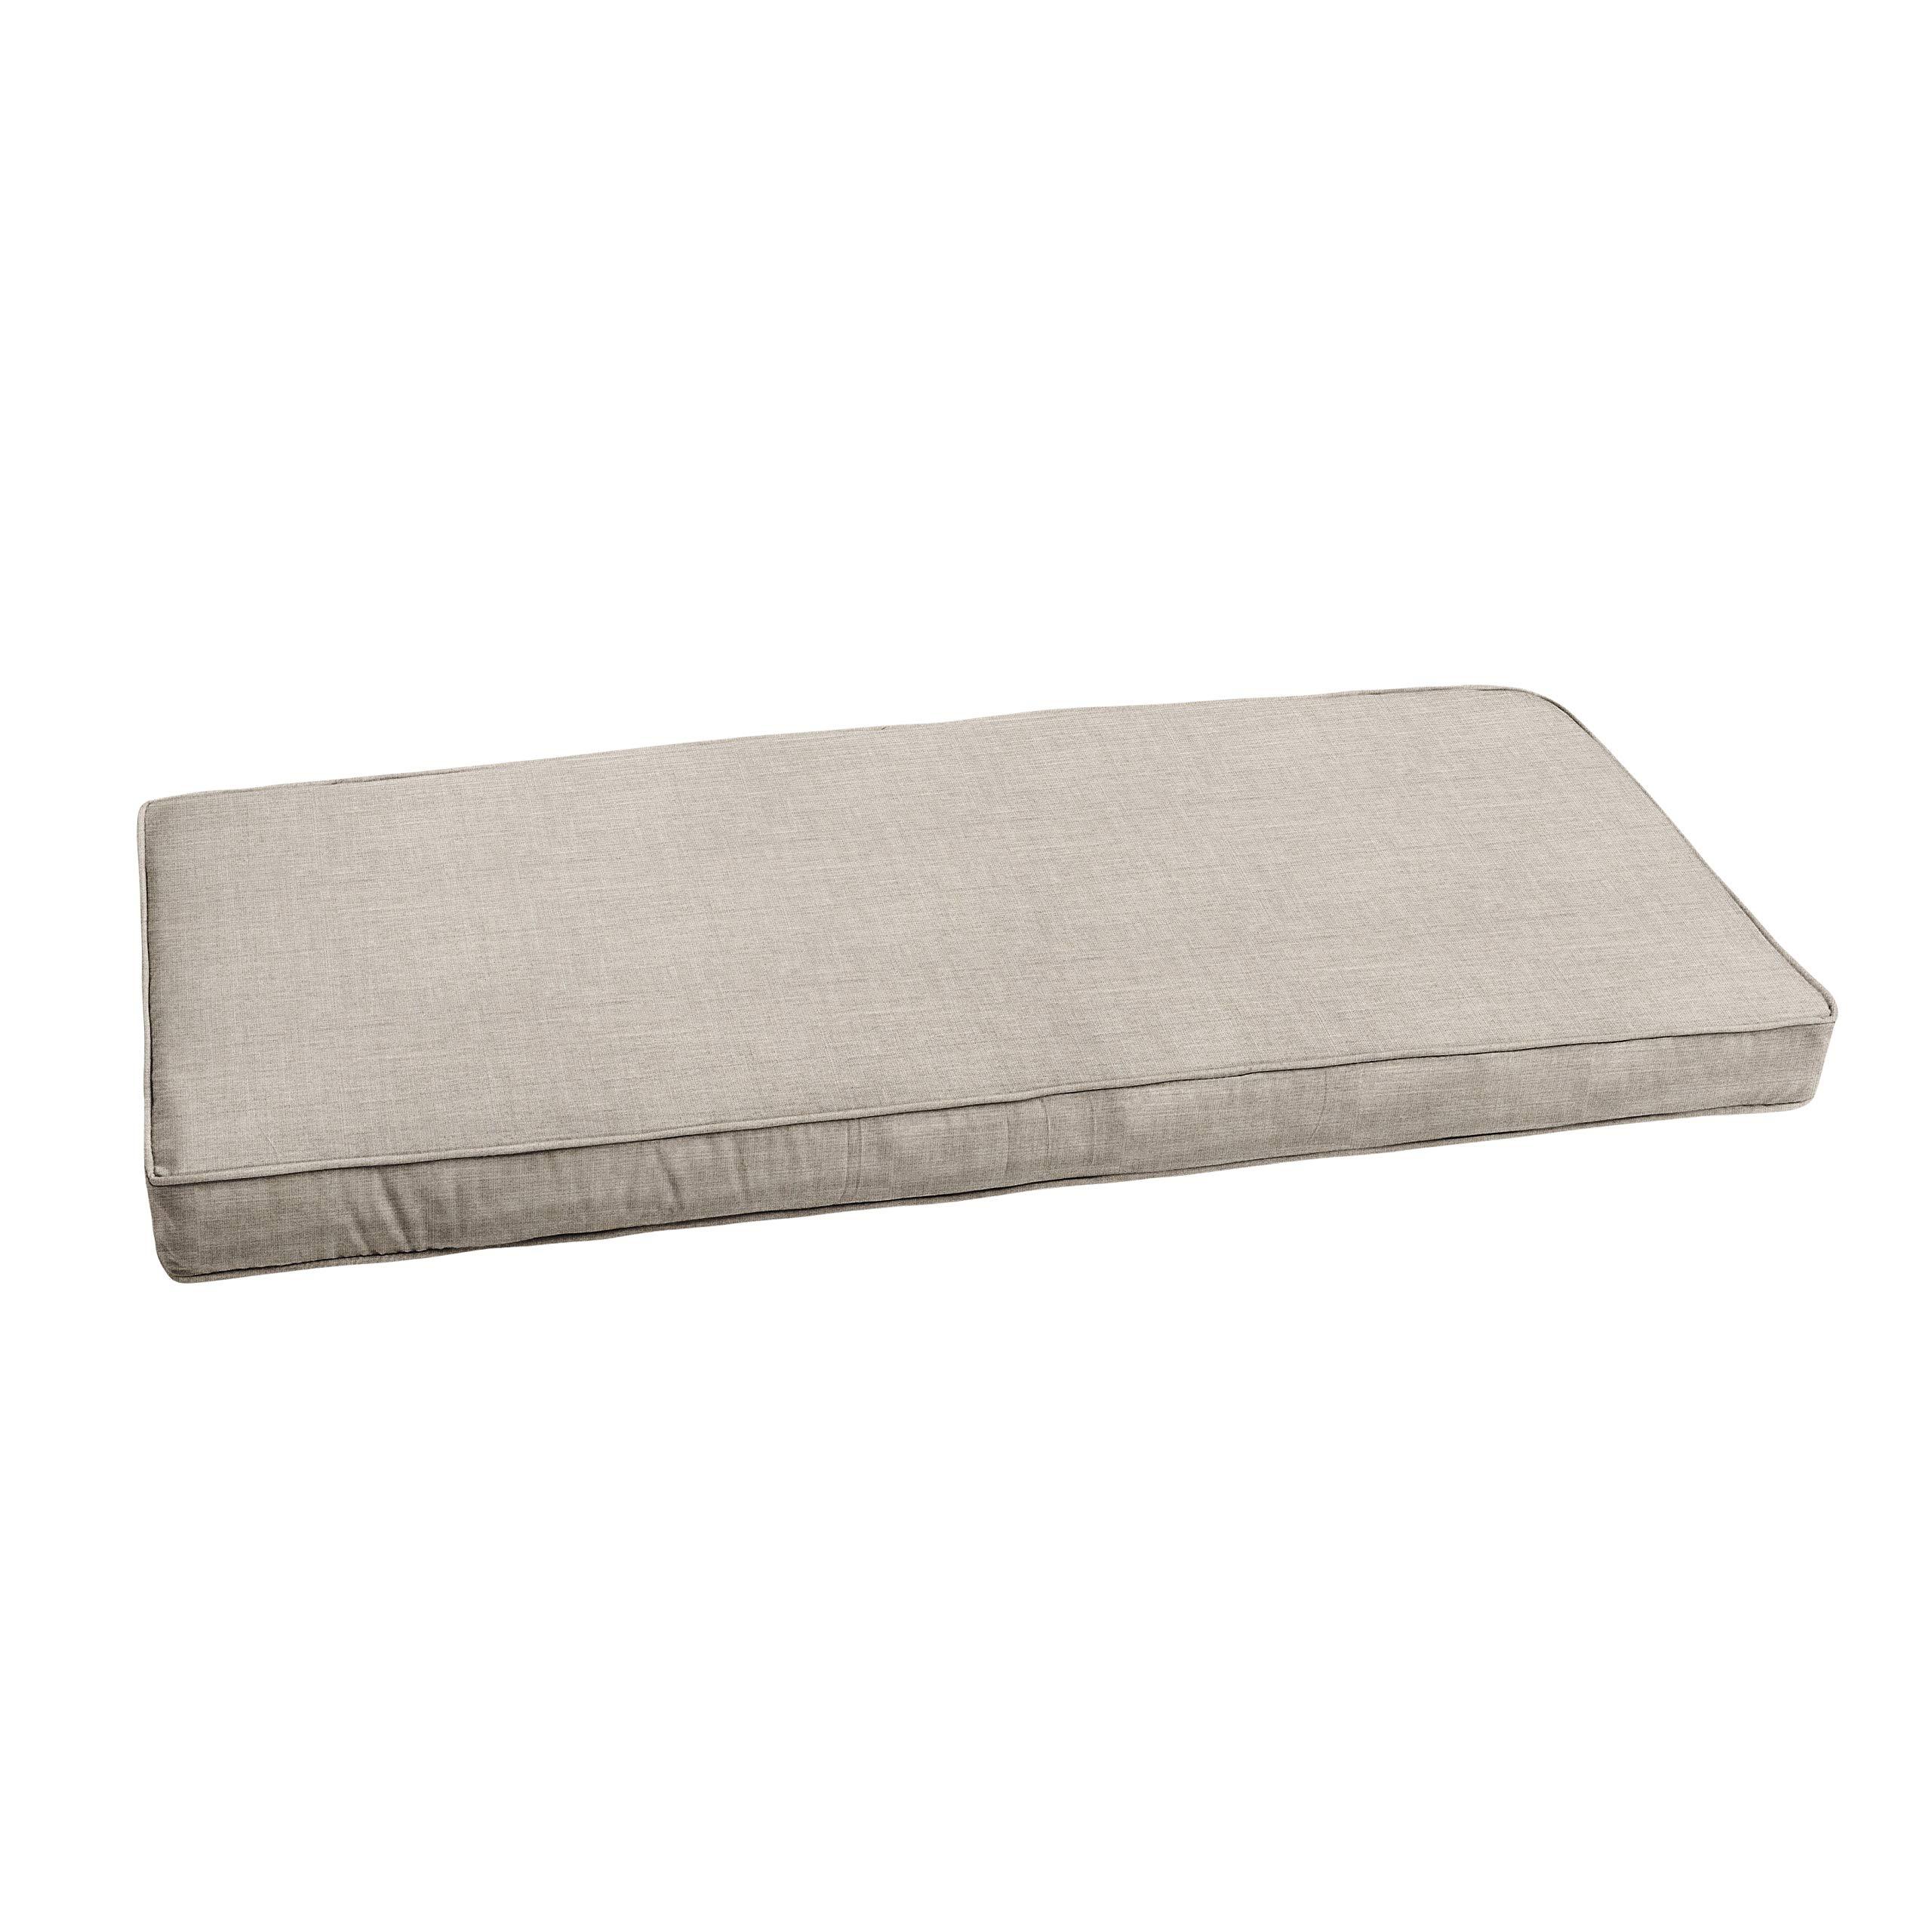 "Mozaic AMZCS113326 Sunbrella Indoor/Outdoor Corded Bench Cushion, 56""x19.5"", Cast Silver"